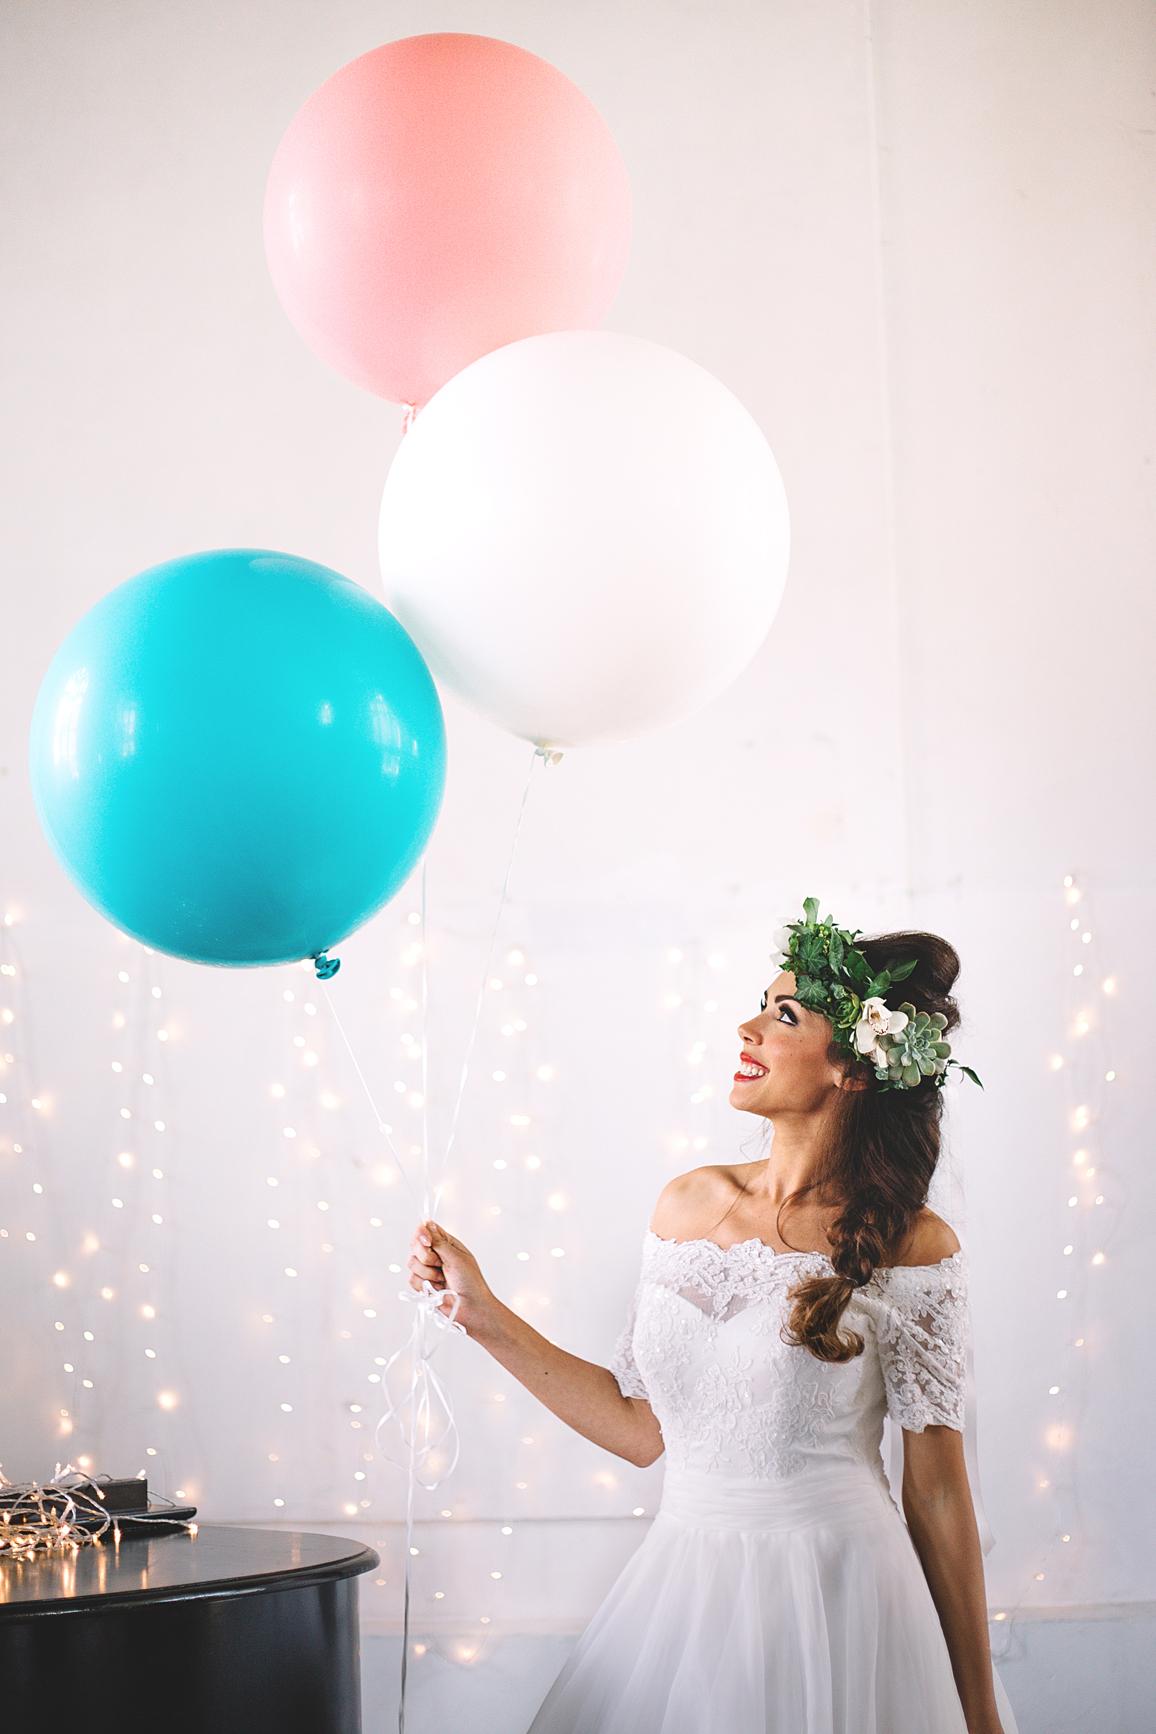 wedding_photographer_norfolk_norwich_kings_lynn (10).jpg